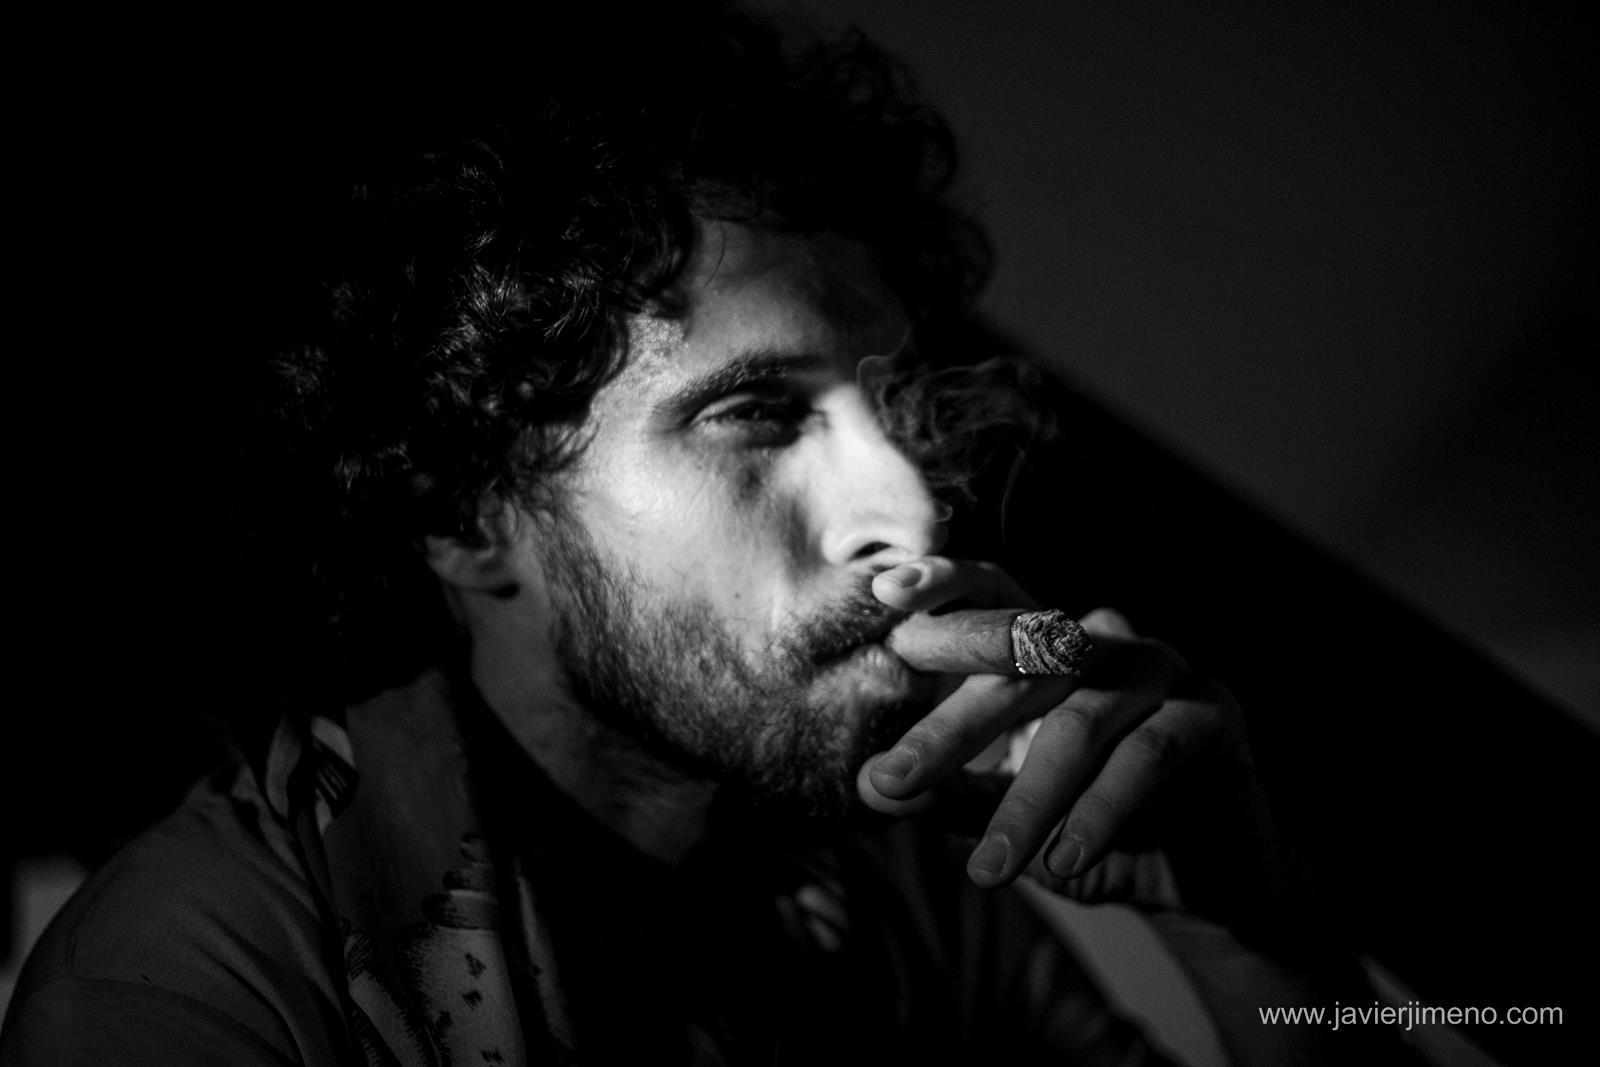 37_Botijo-Rojo-II_photoAlquimia_Javier.Jimeno-Maté-07